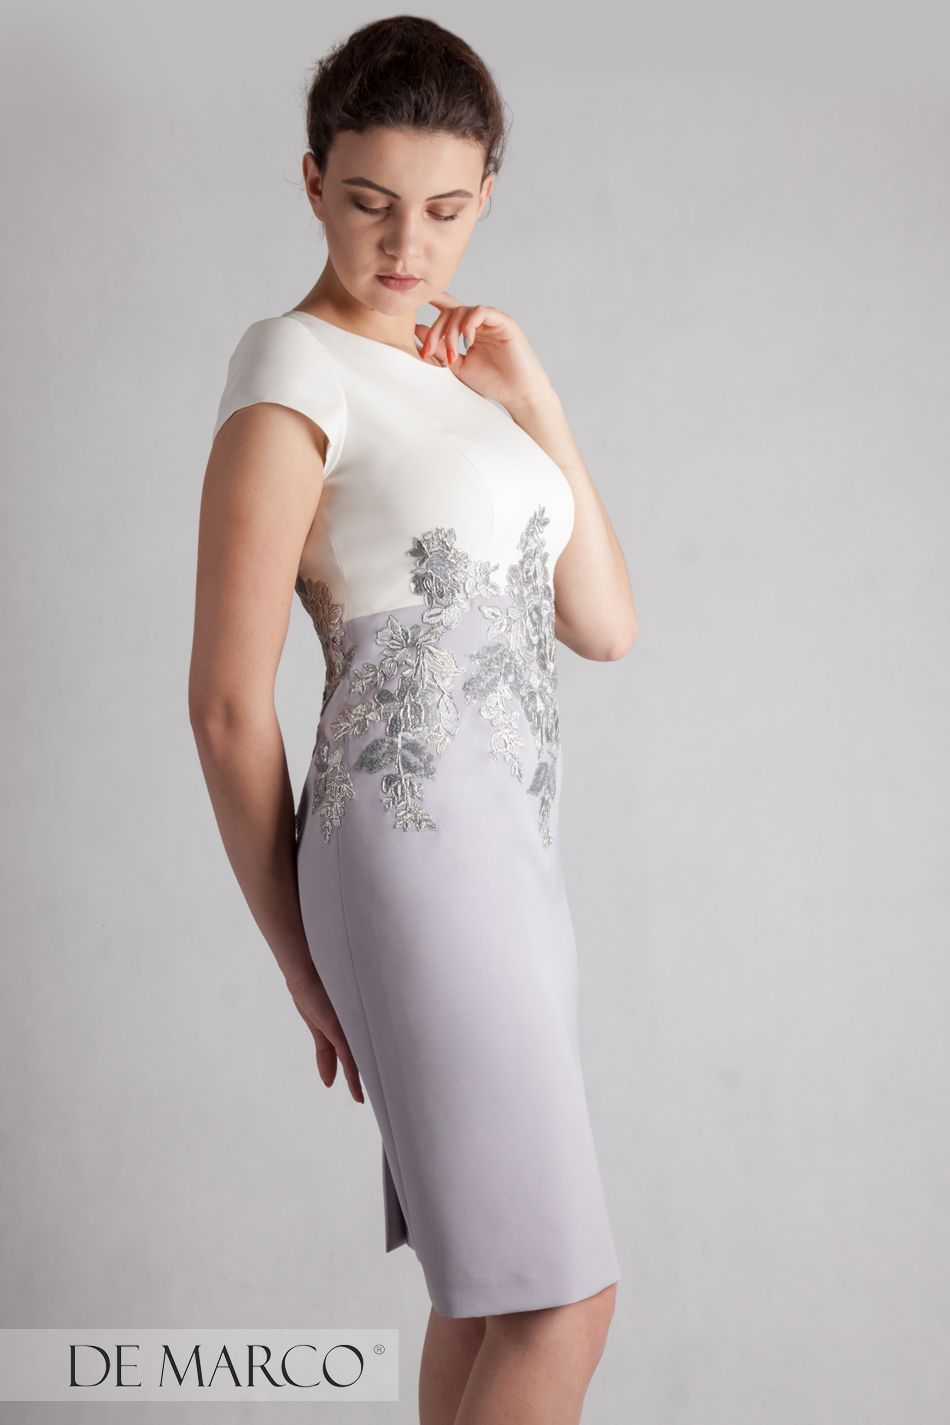 da3a8a39fc Stylizacja Dla Mamy Pana Młodego Młodej Pani Sukienka Na Wesele